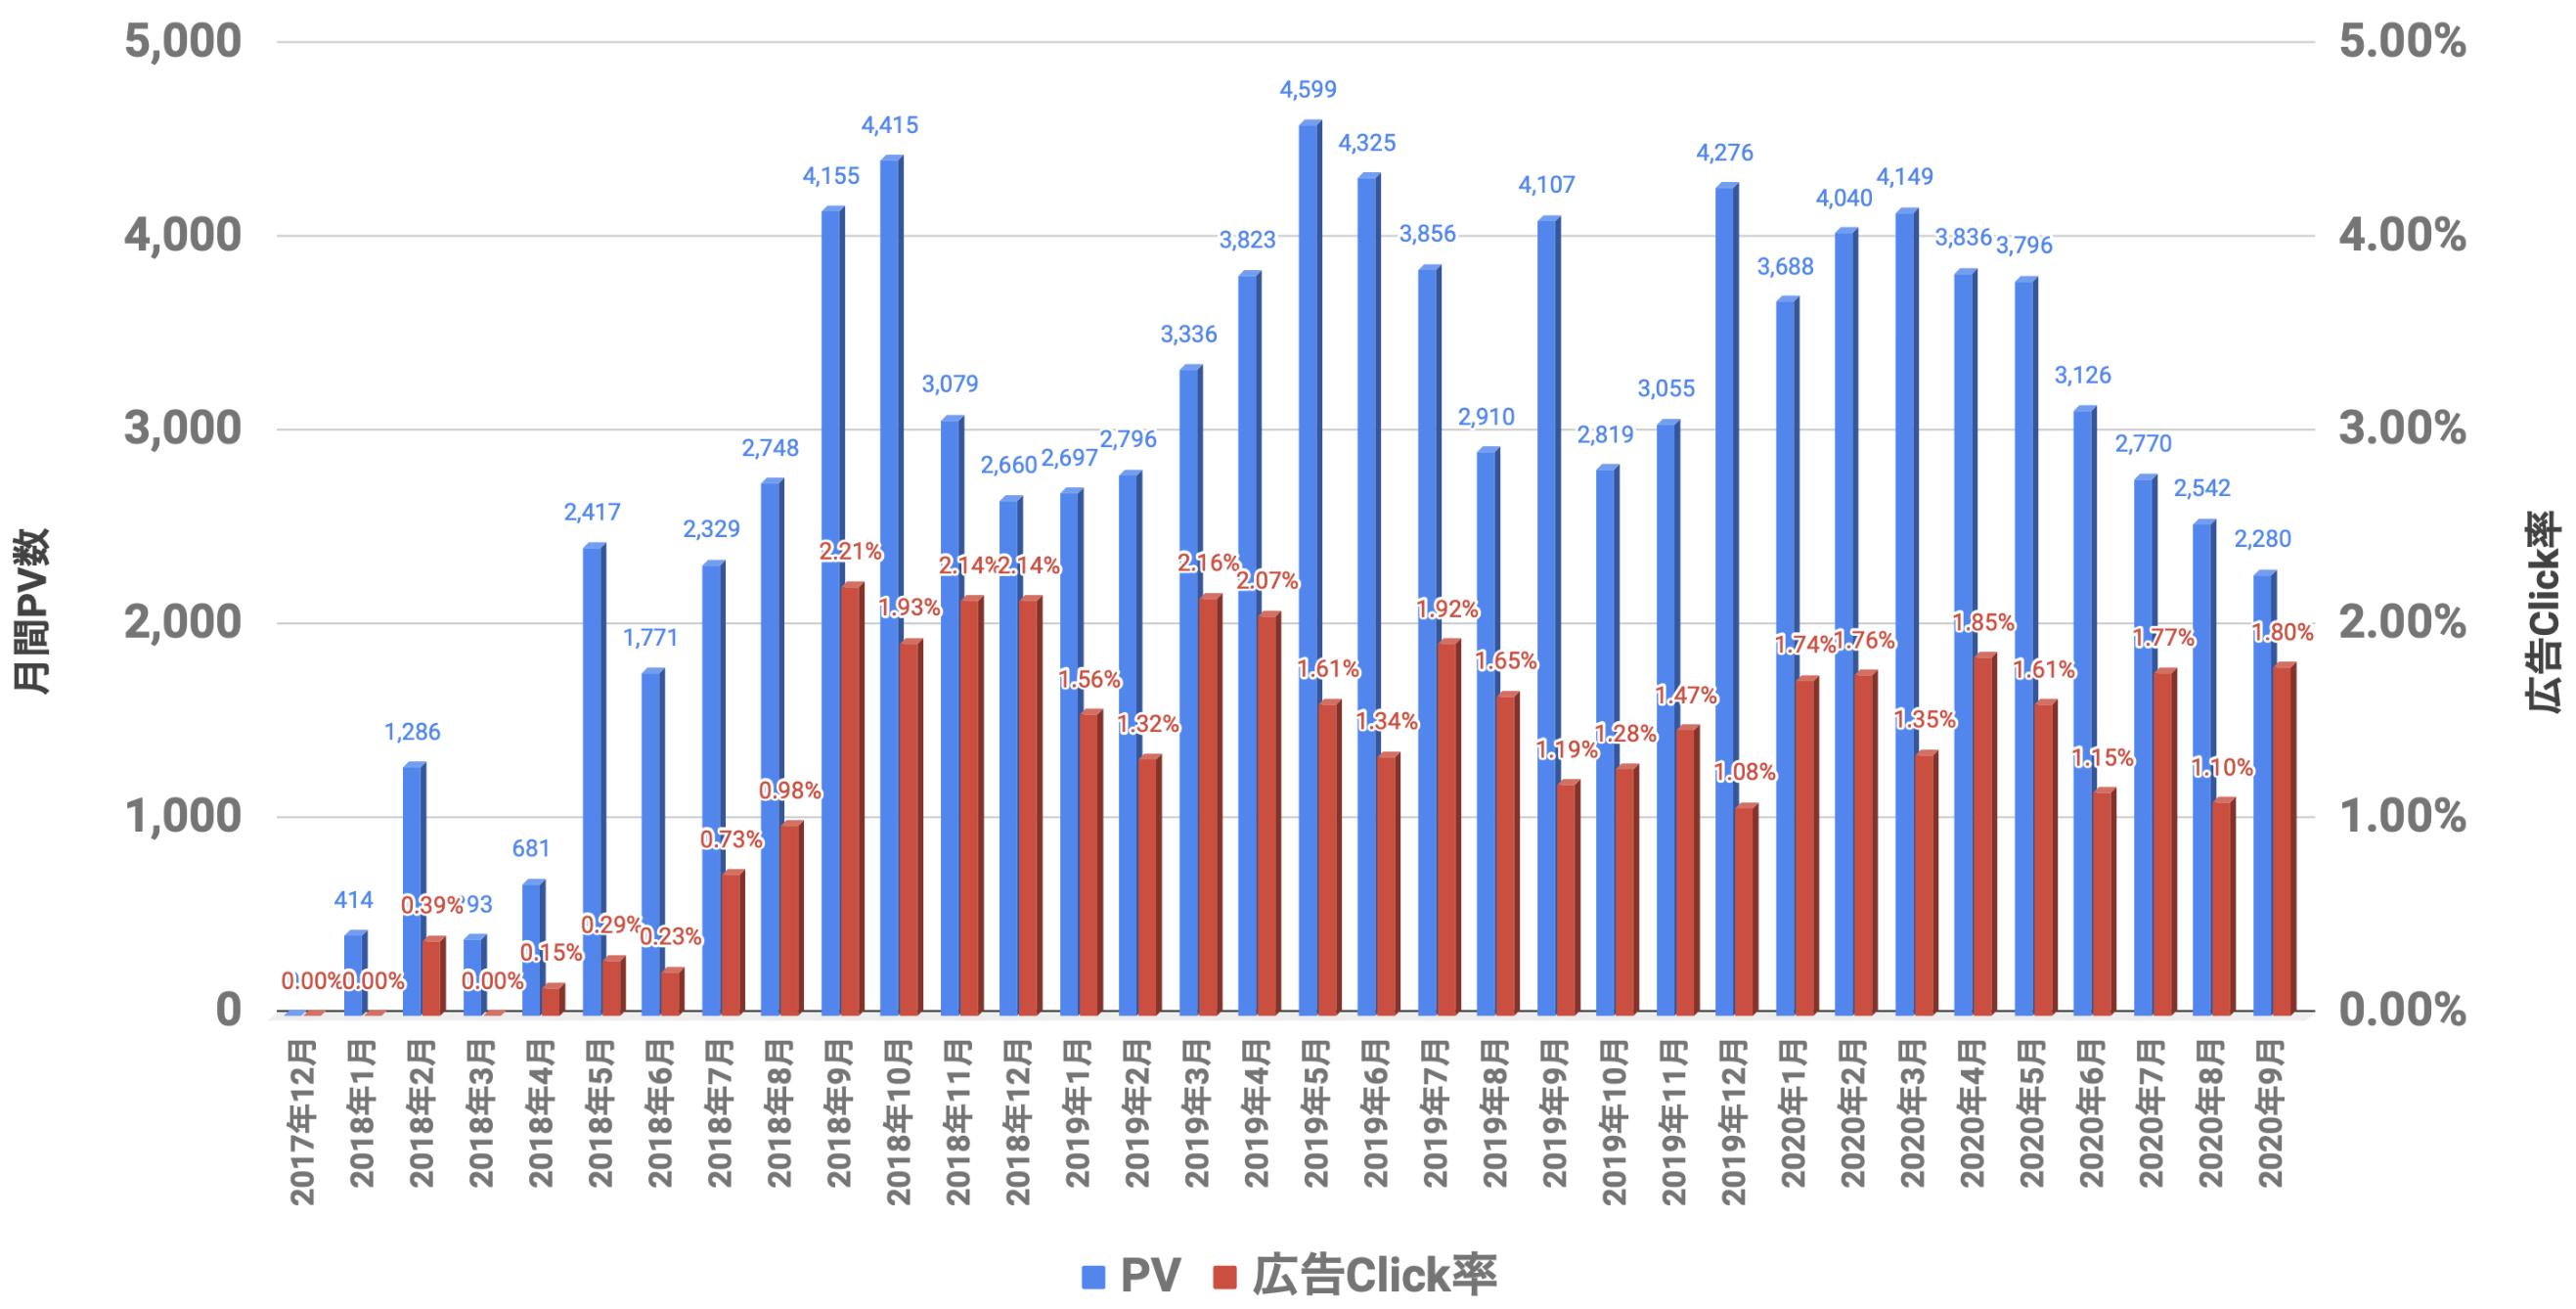 PVと広告Click率 2020年09月